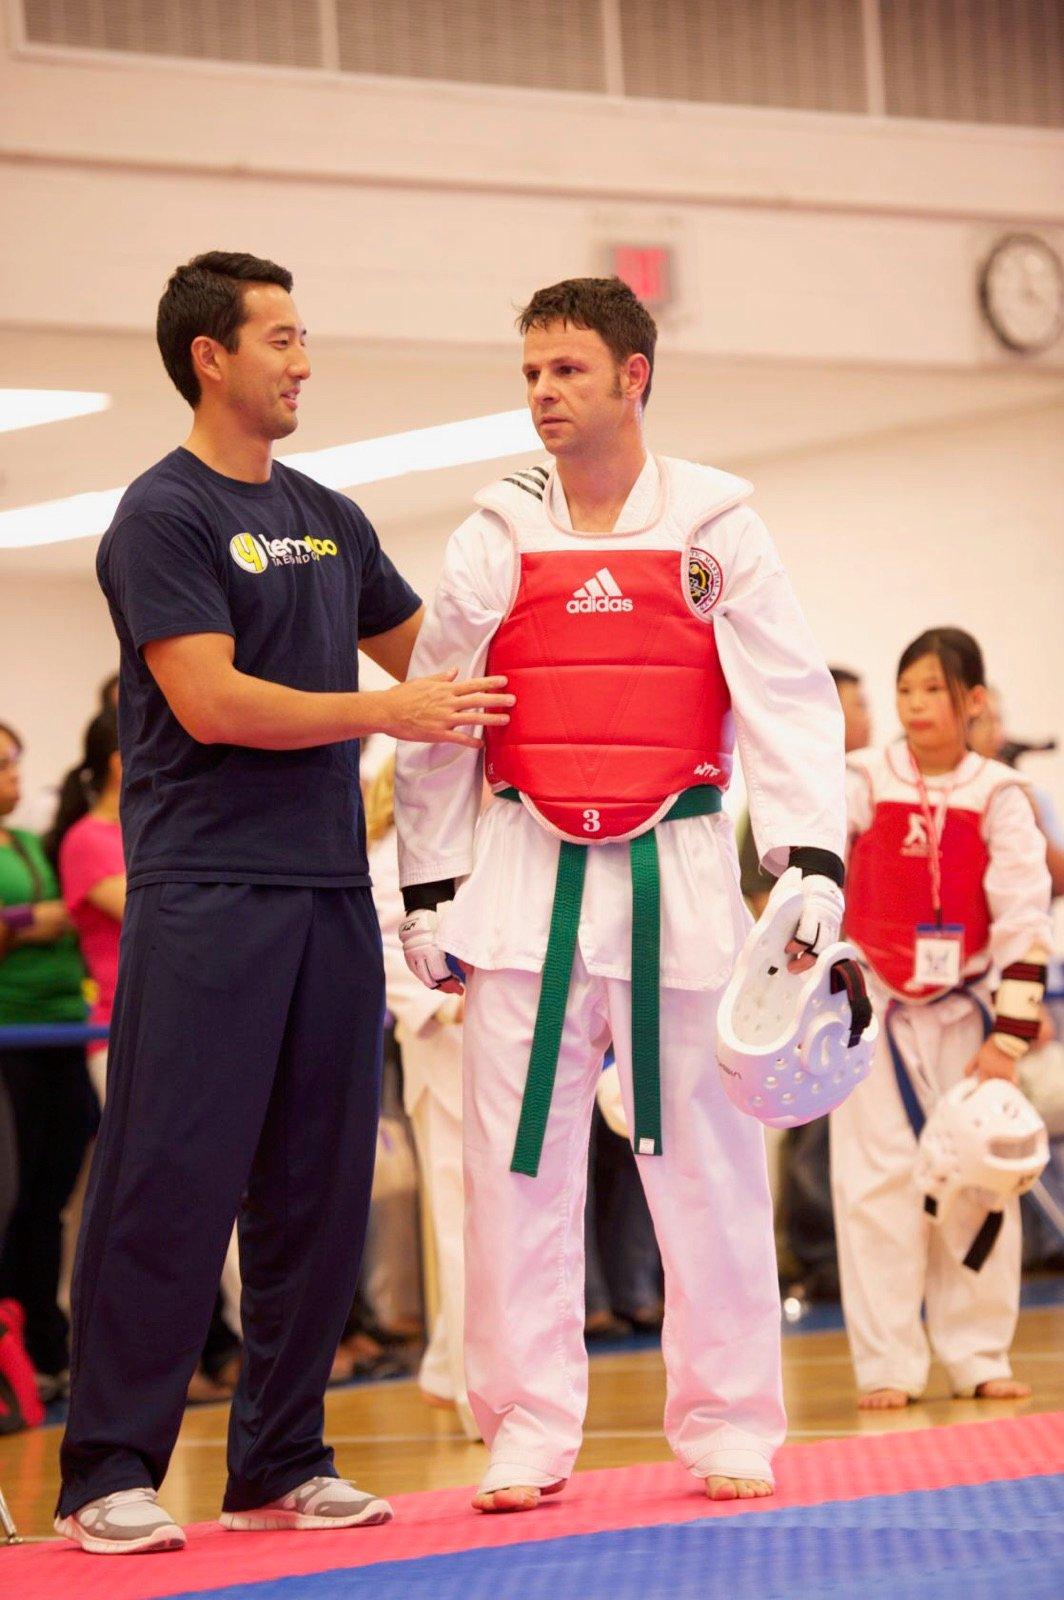 How Cathal Armstrong Juggles 4 Restaurants, 2 Kids, and Still Wins National Taekwondo Championships